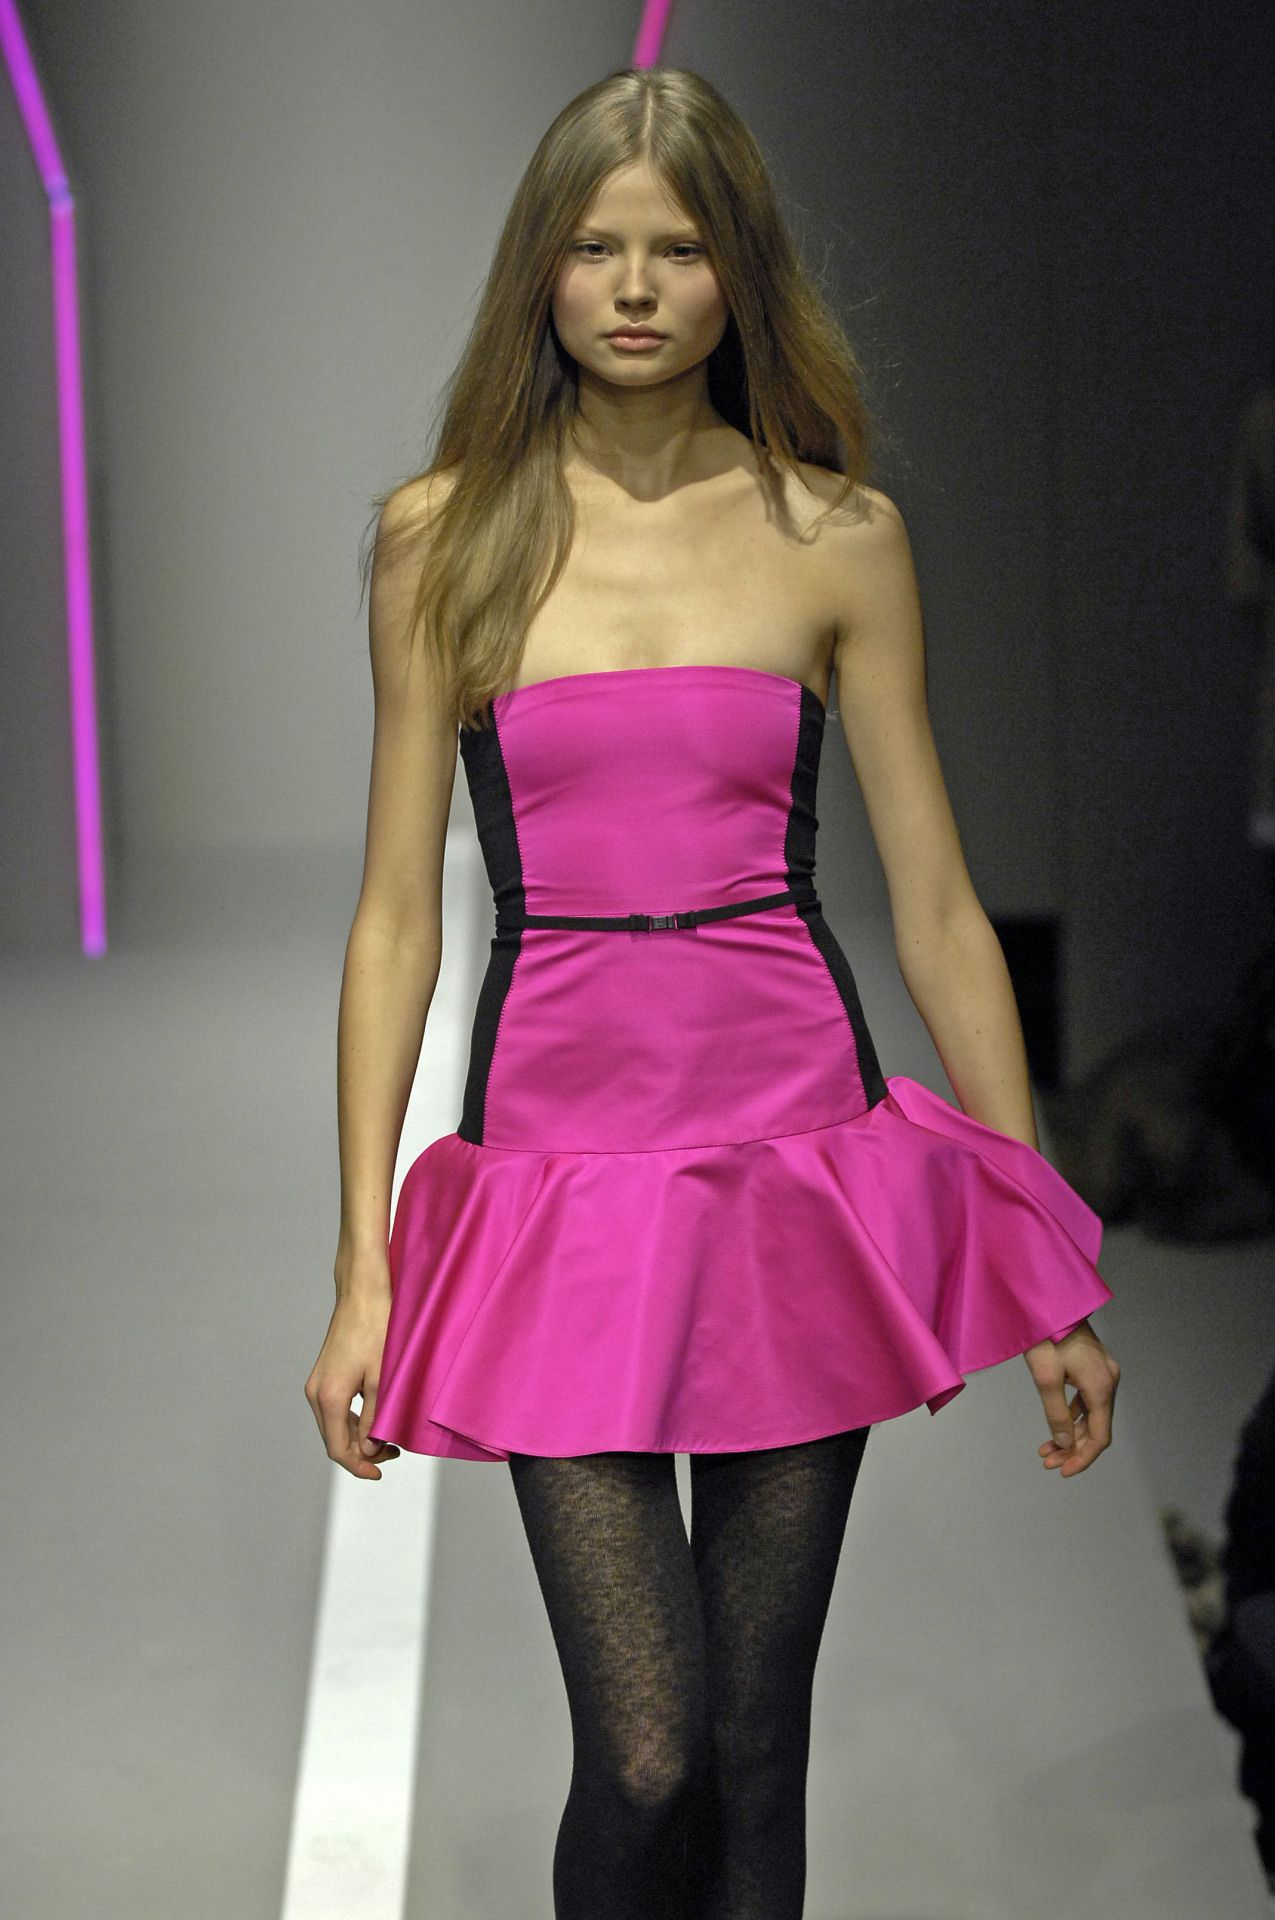 Pin by babie on magdalena frackowiak fashion